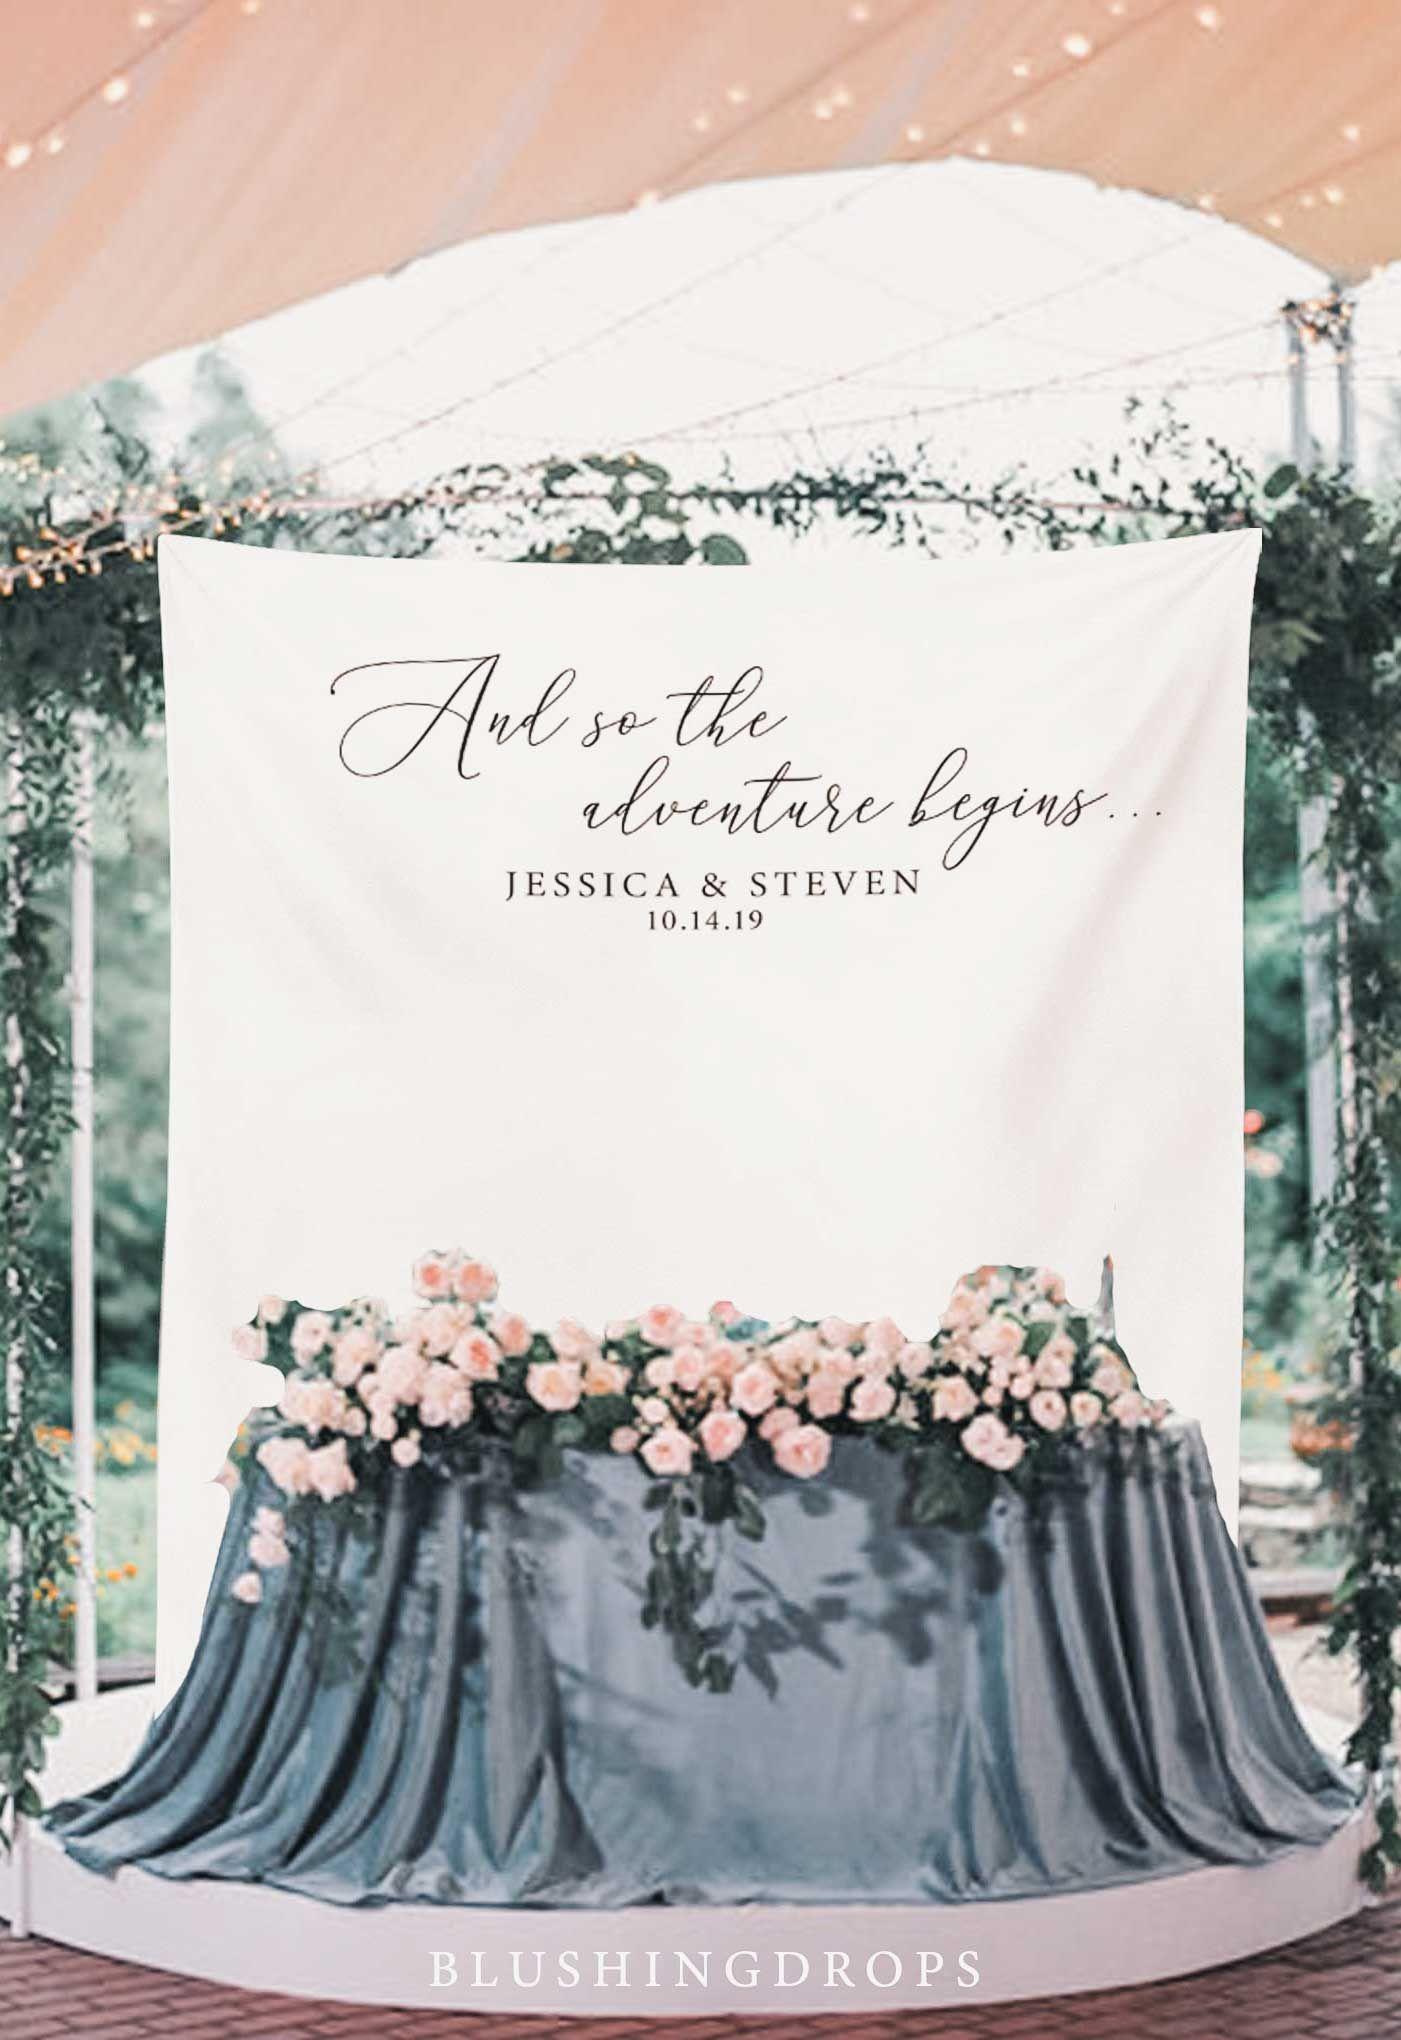 Backdrop For Wedding Rustic Wedding Decorations Wedding Photo Booth Wedding Banner Wedding Reception Calligraphy Backdrop Ideas Wedding Reception Backdrop Wedding Banner Wedding Backdrop